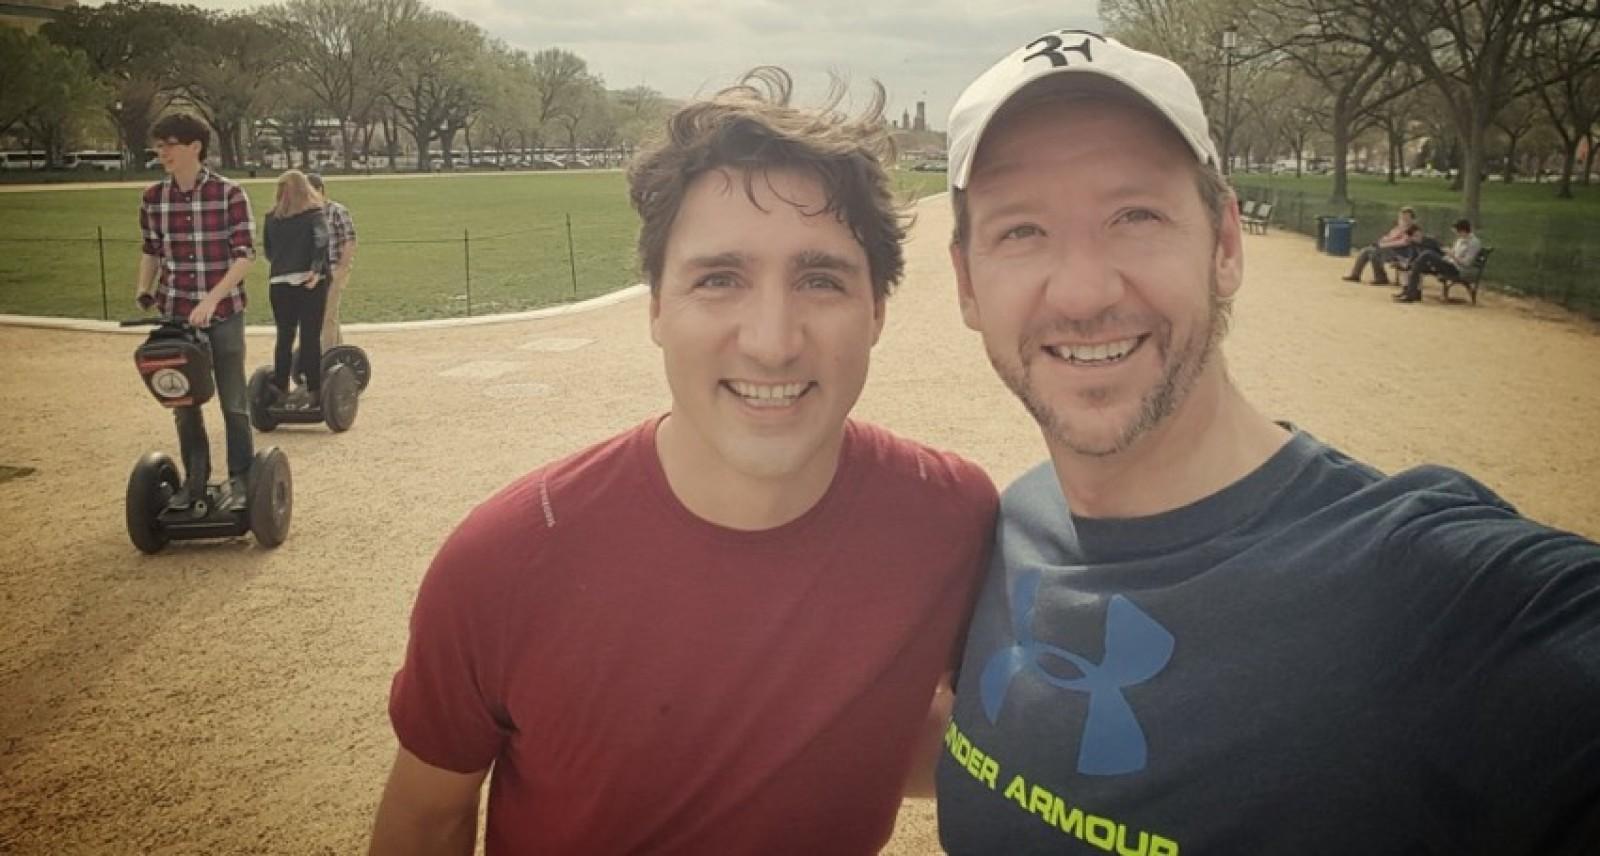 Canada's Trudeau admits 'erosion of trust' in SNC-Lavalin case